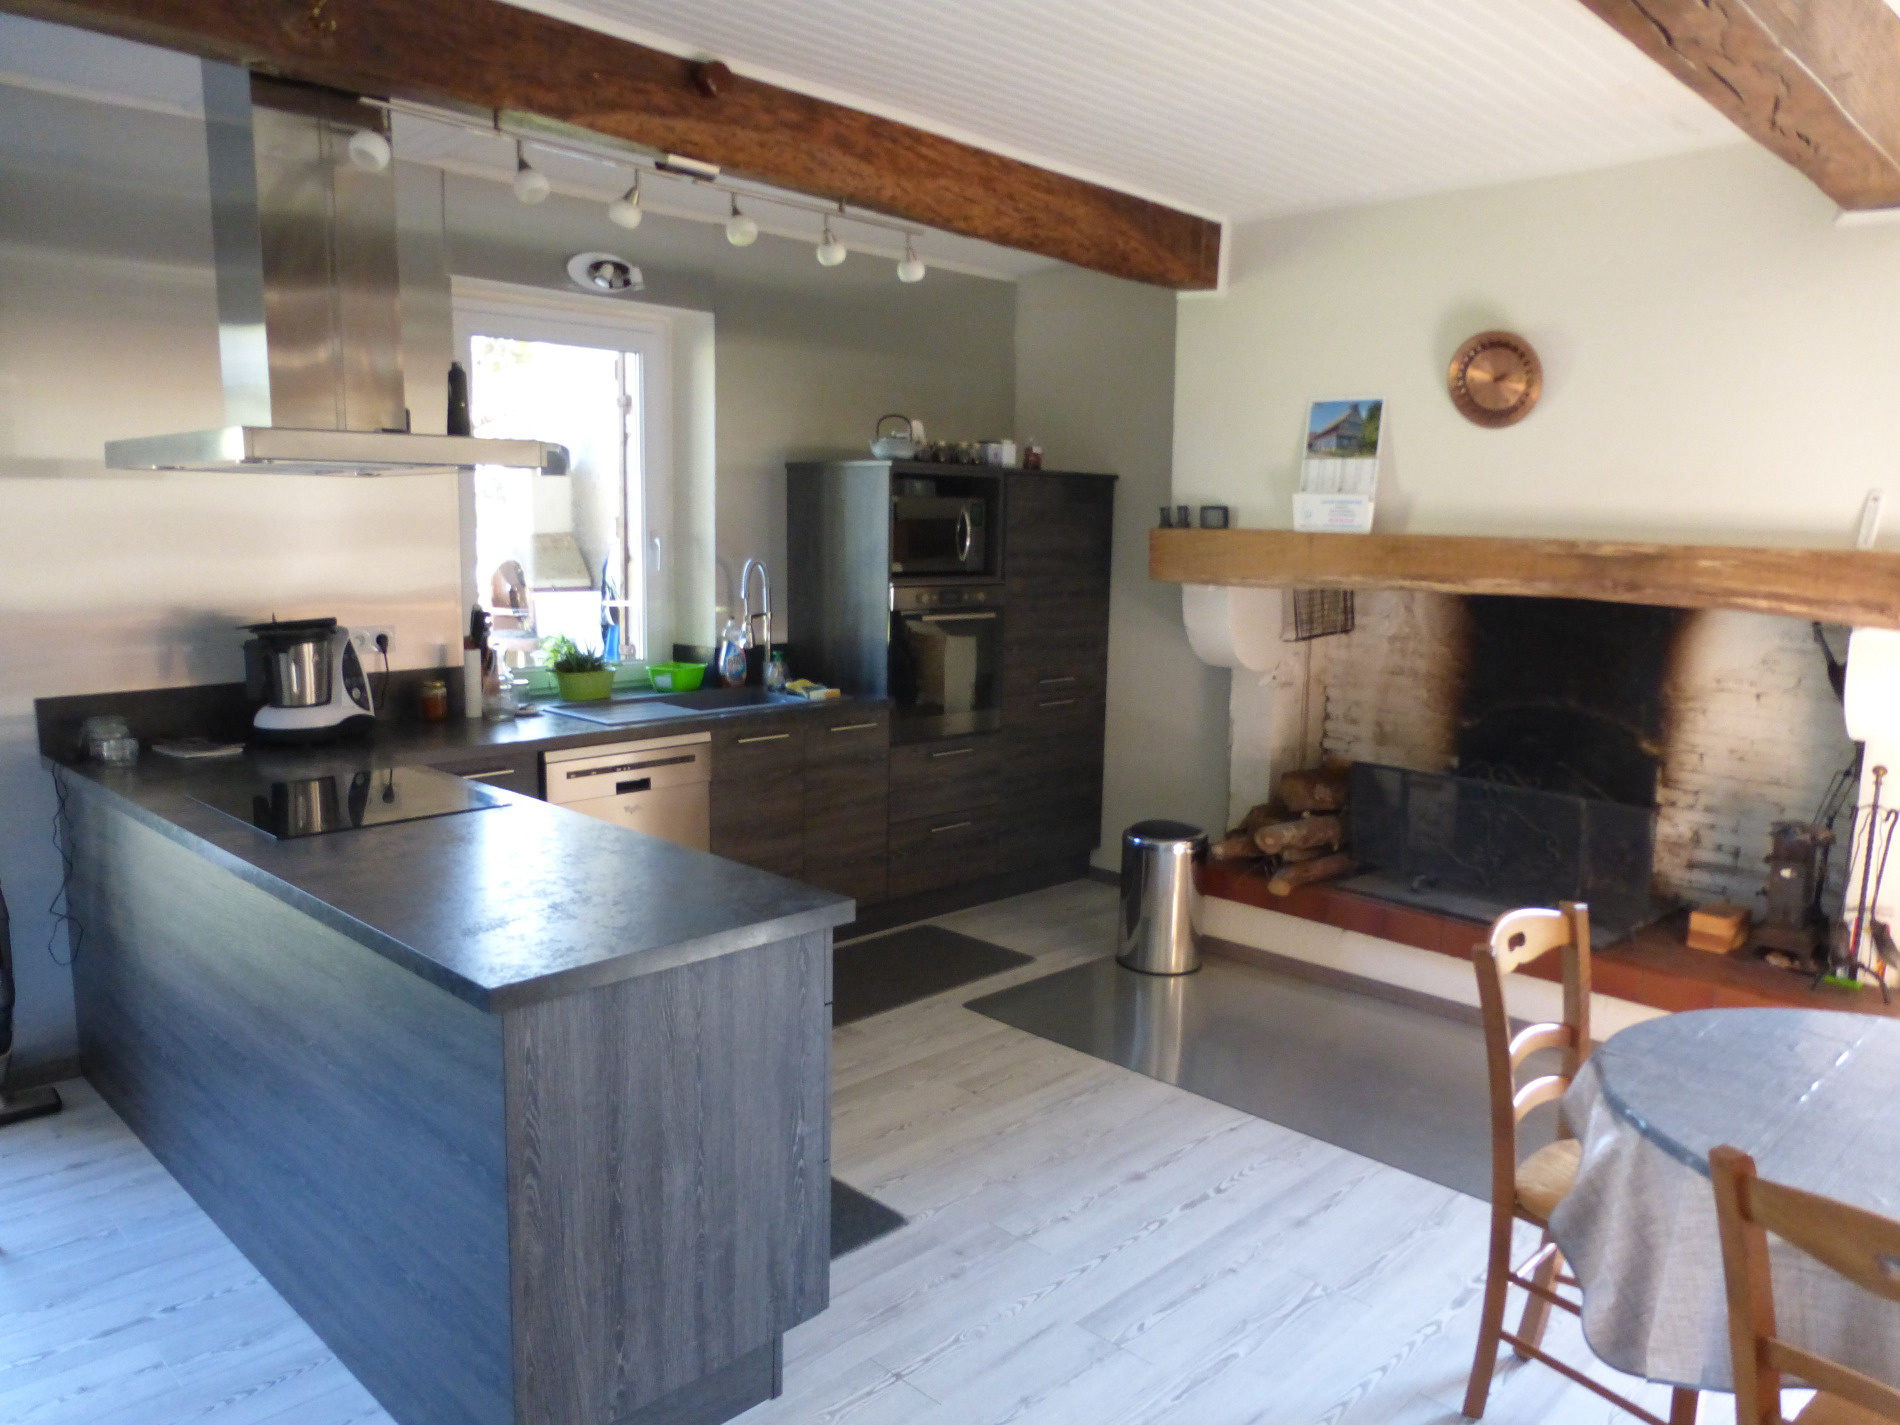 vente maison landaise enti rement renov e. Black Bedroom Furniture Sets. Home Design Ideas